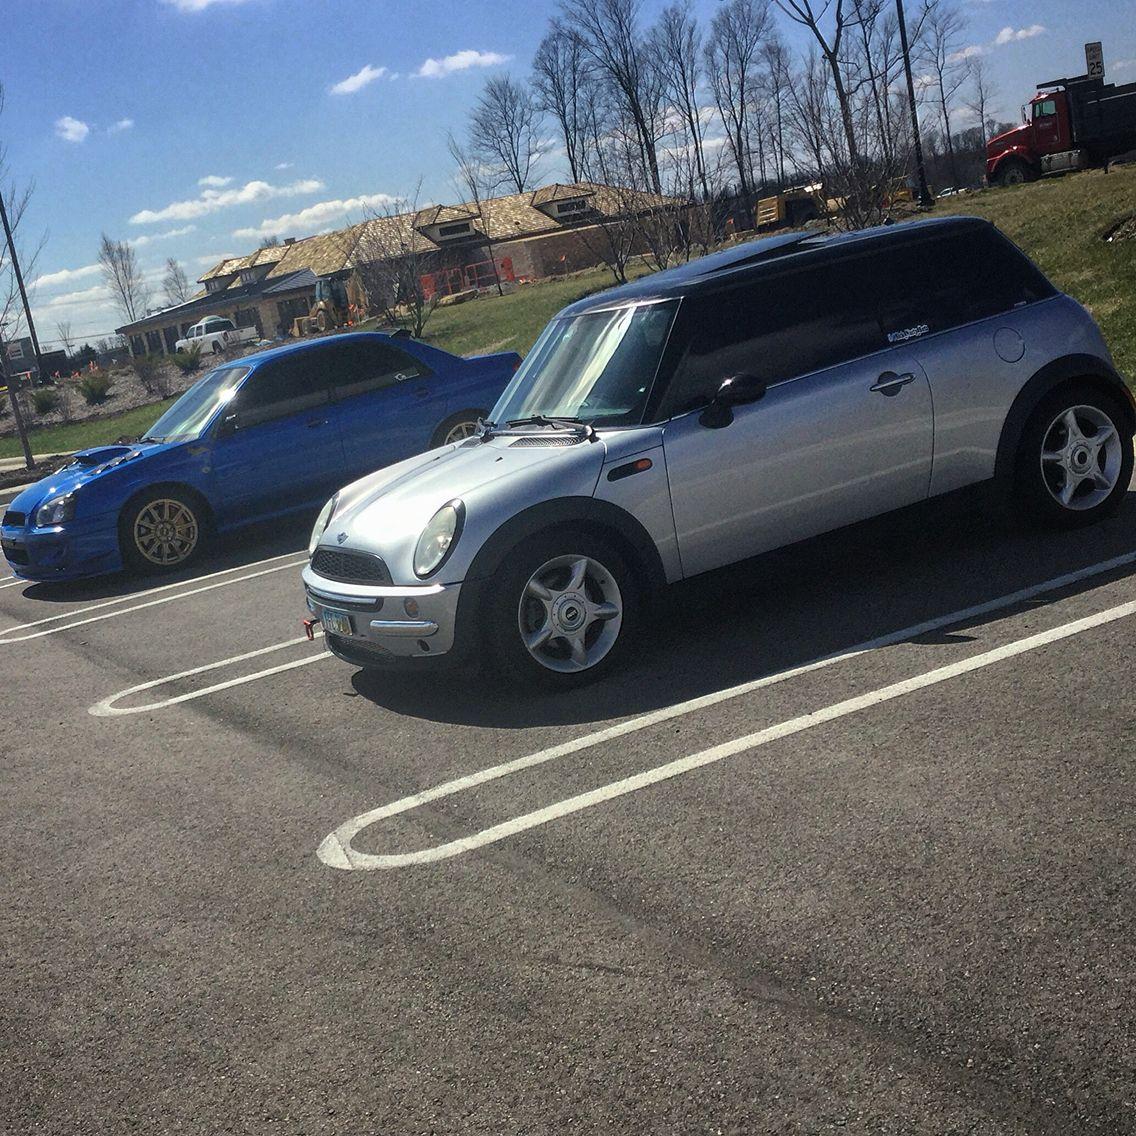 04 R50 Mini Cooper And A Subaru Wrx Sti Sitting Clean Mean